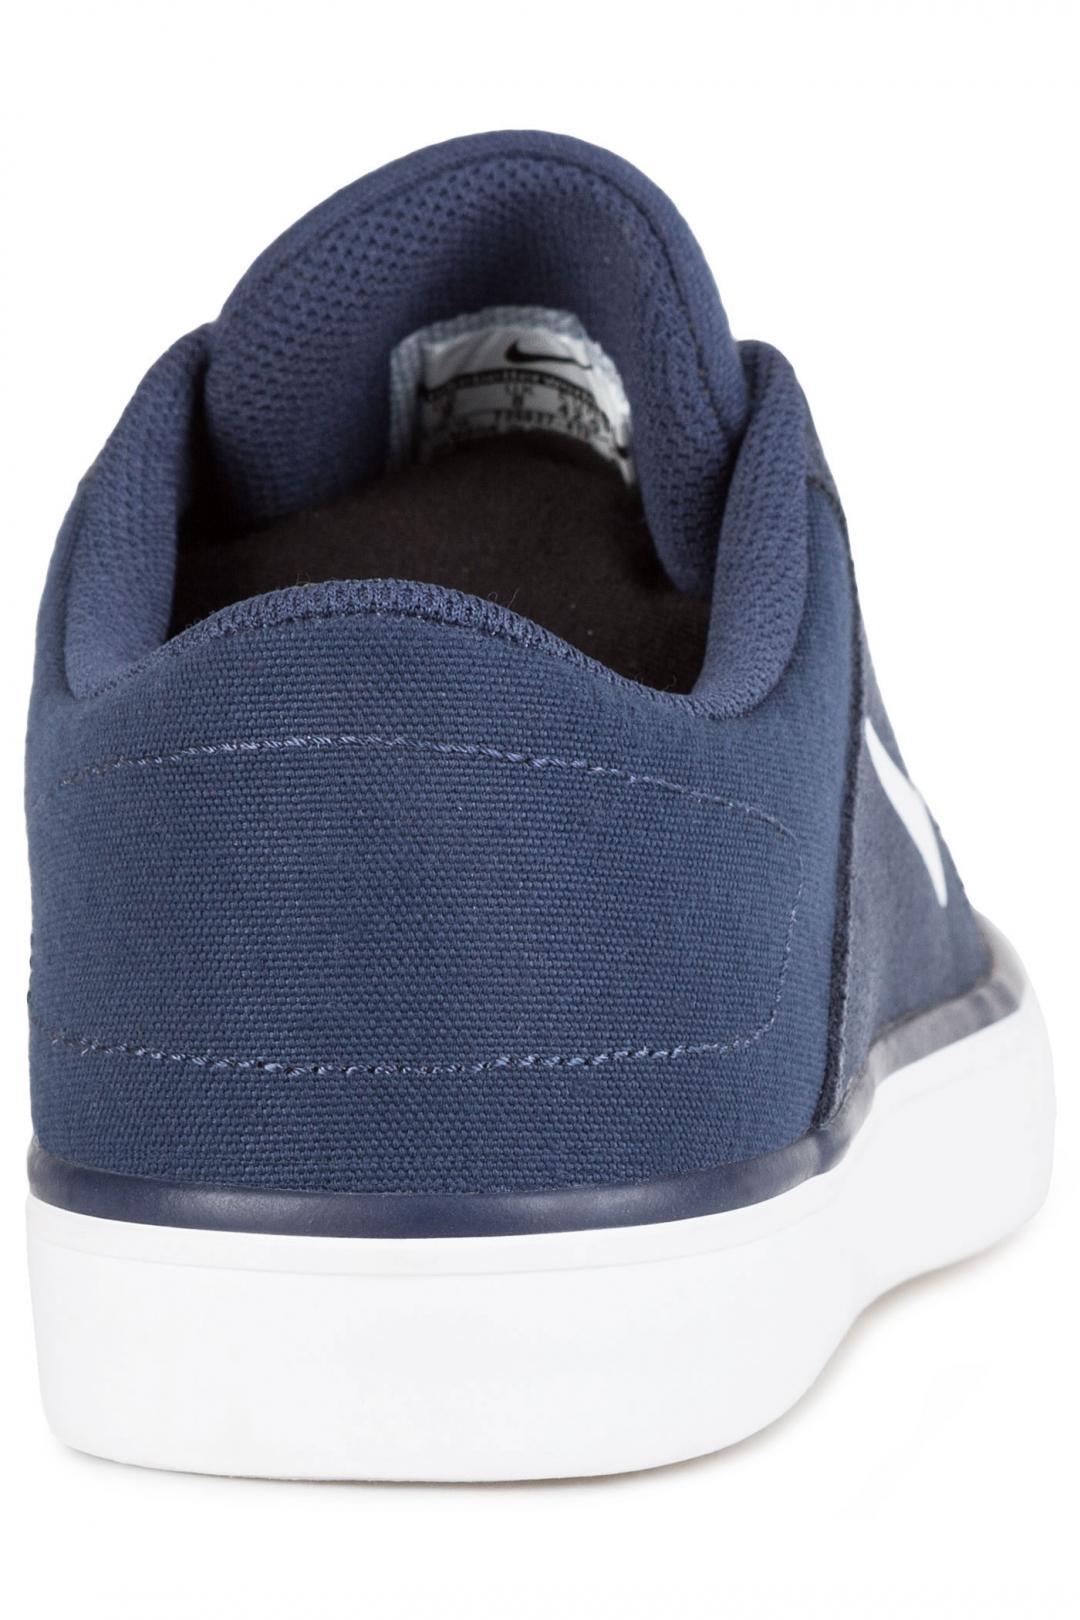 Uomo Nike SB Portmore midnight navy white | Scarpe da skate